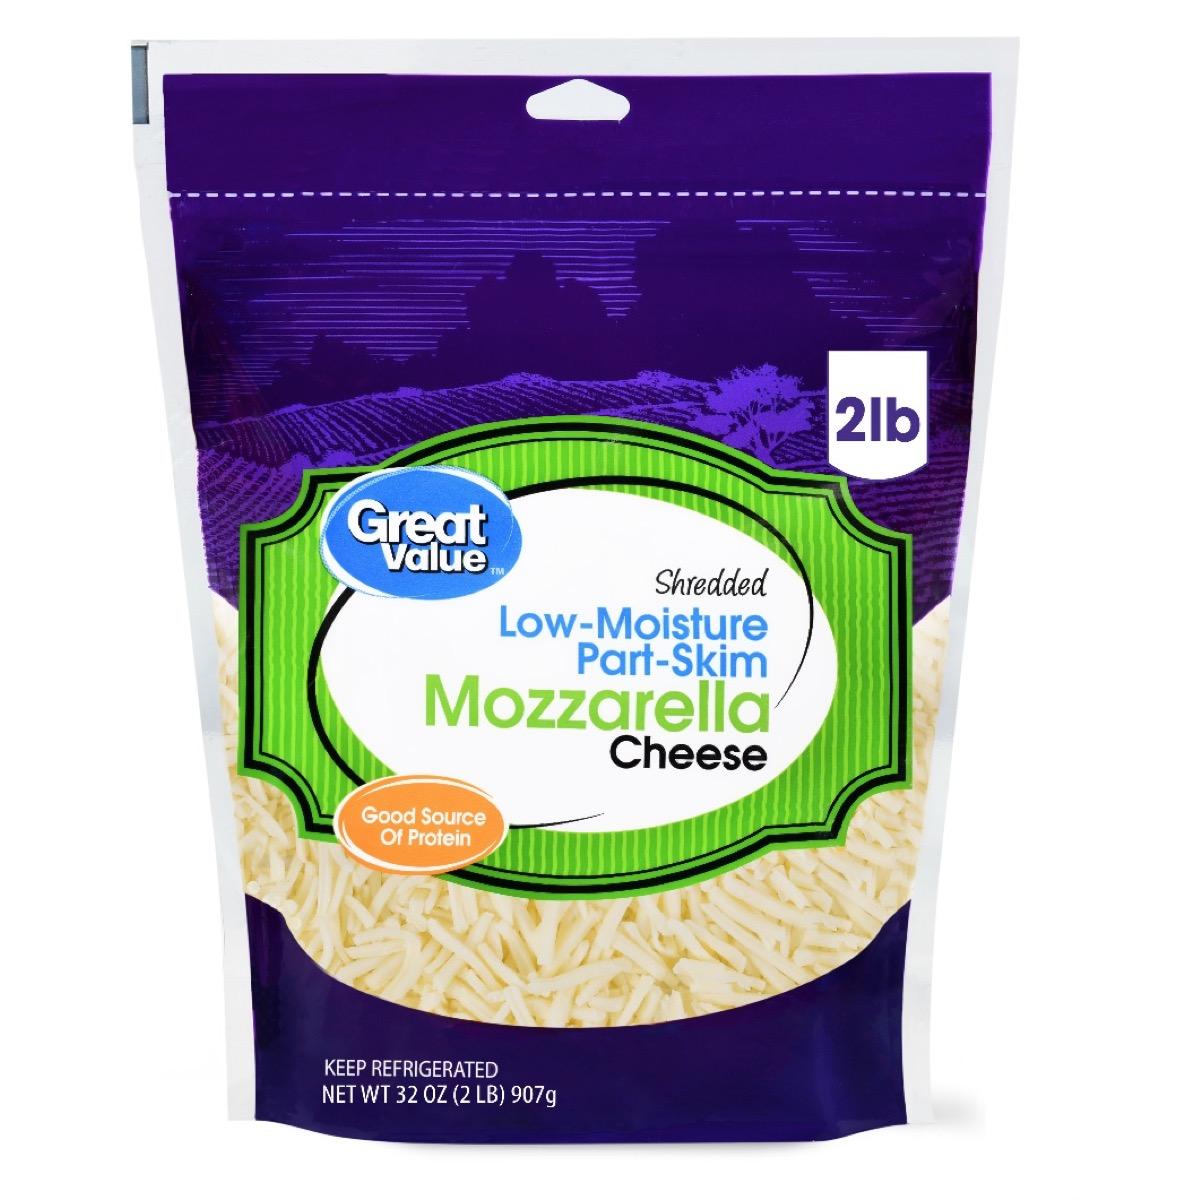 Walmart Great Value Mozzarella